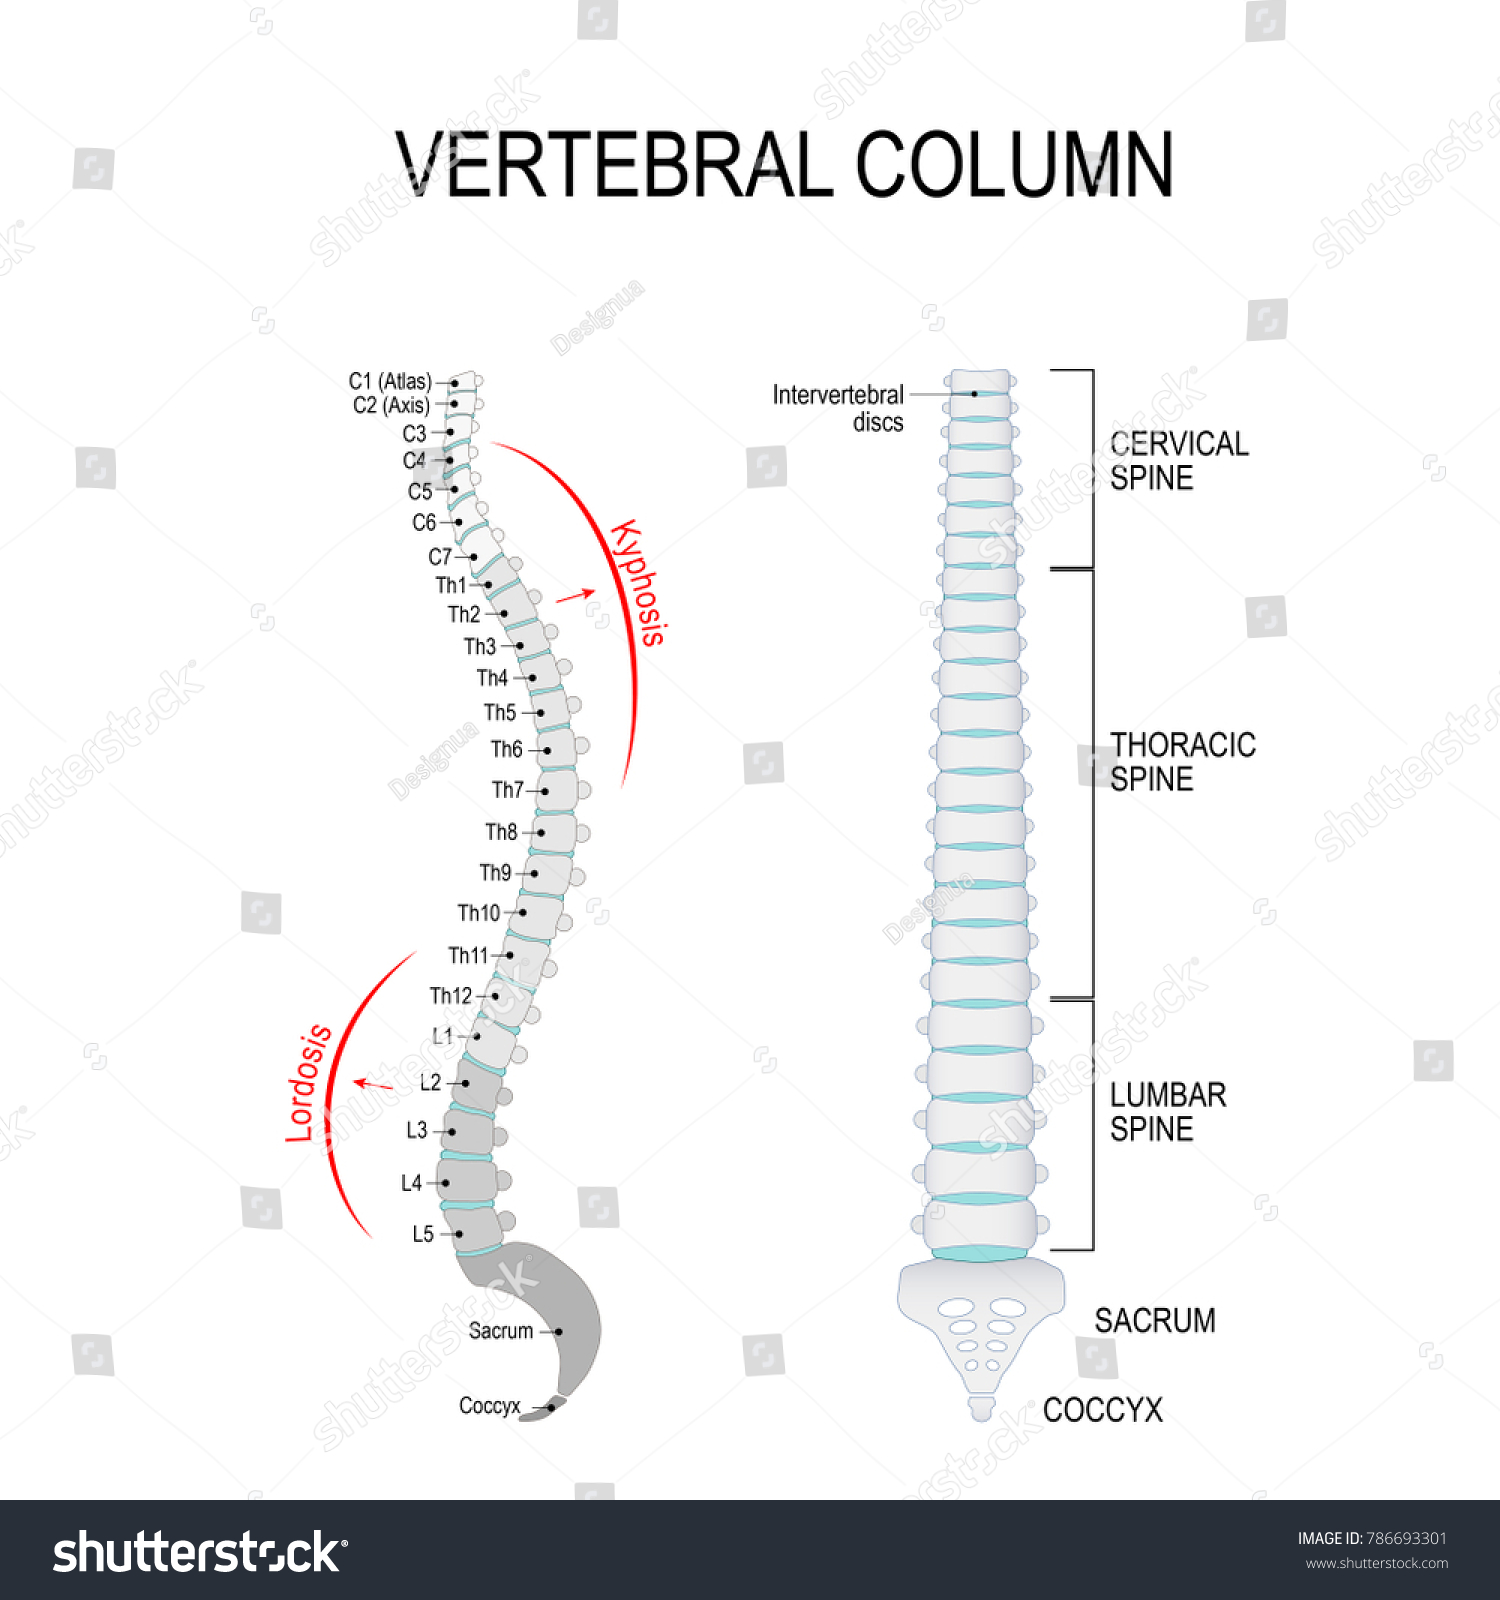 Vertebral Column Cervical Thoracic Lumbar Spine Stock Vector